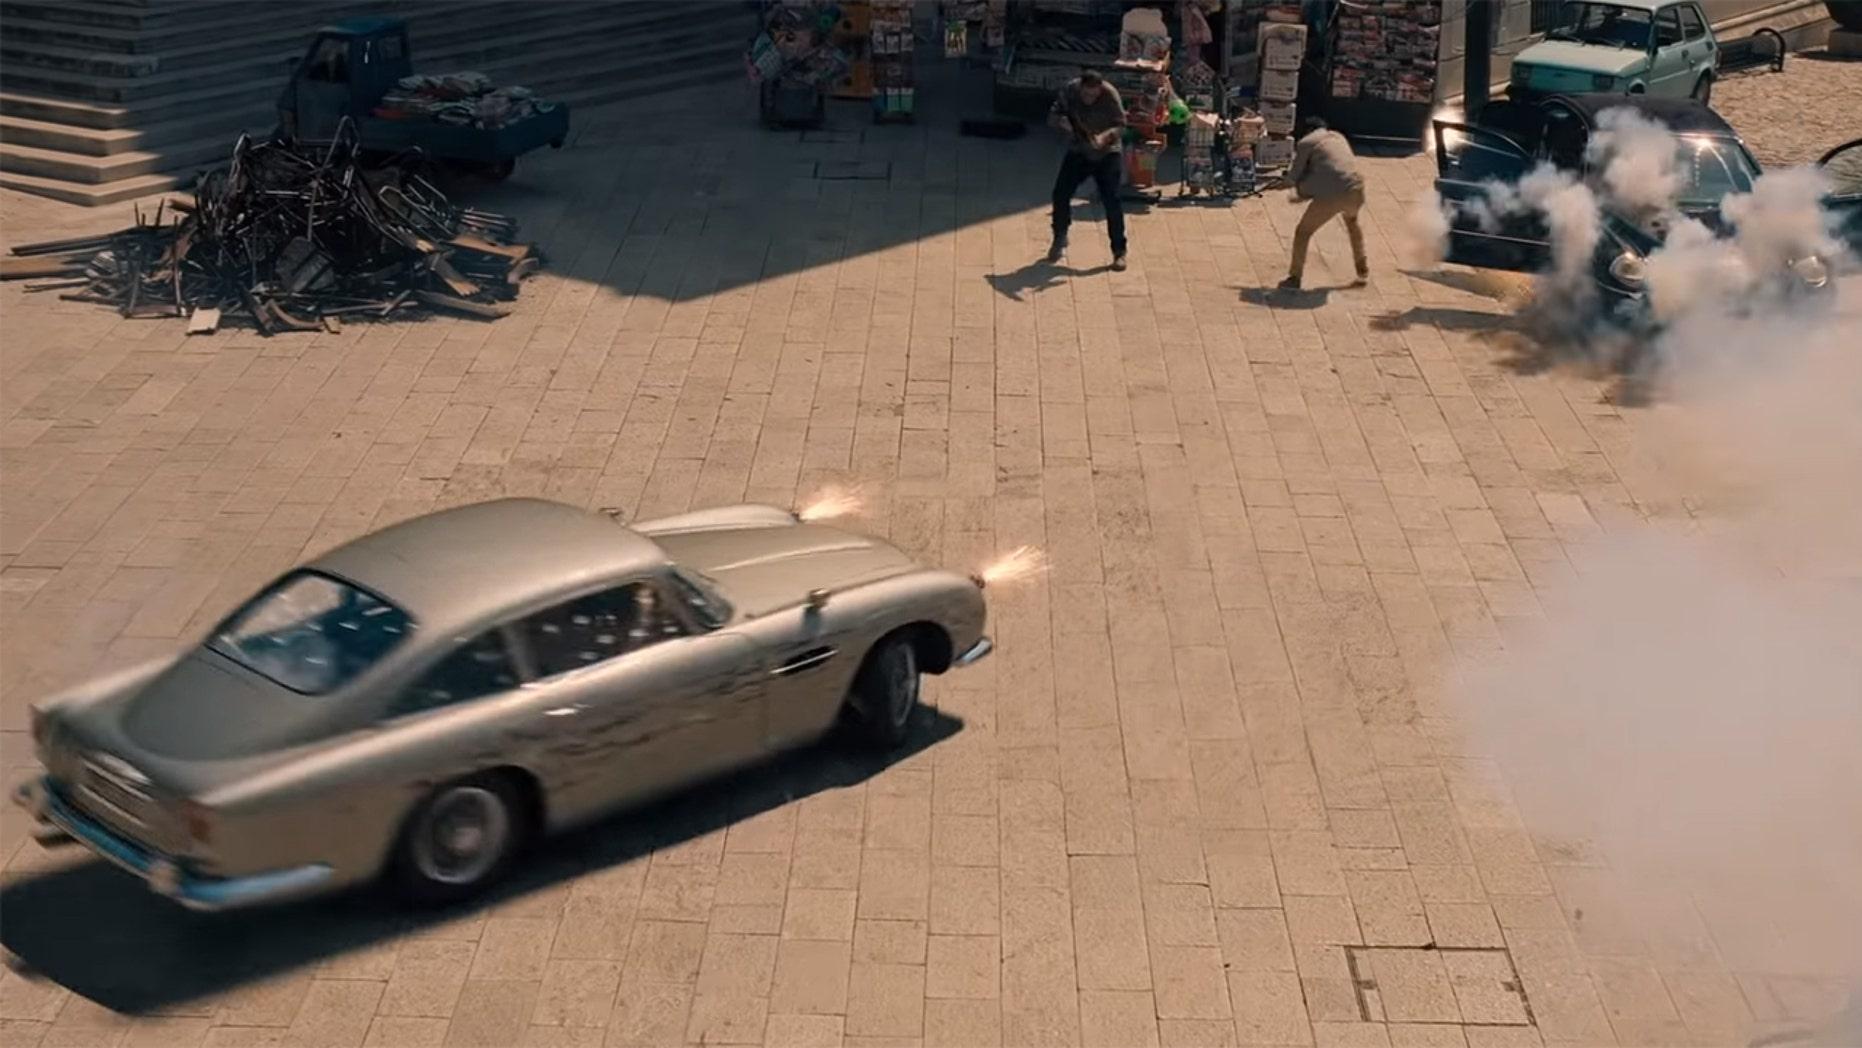 007's Aston Martin DB5